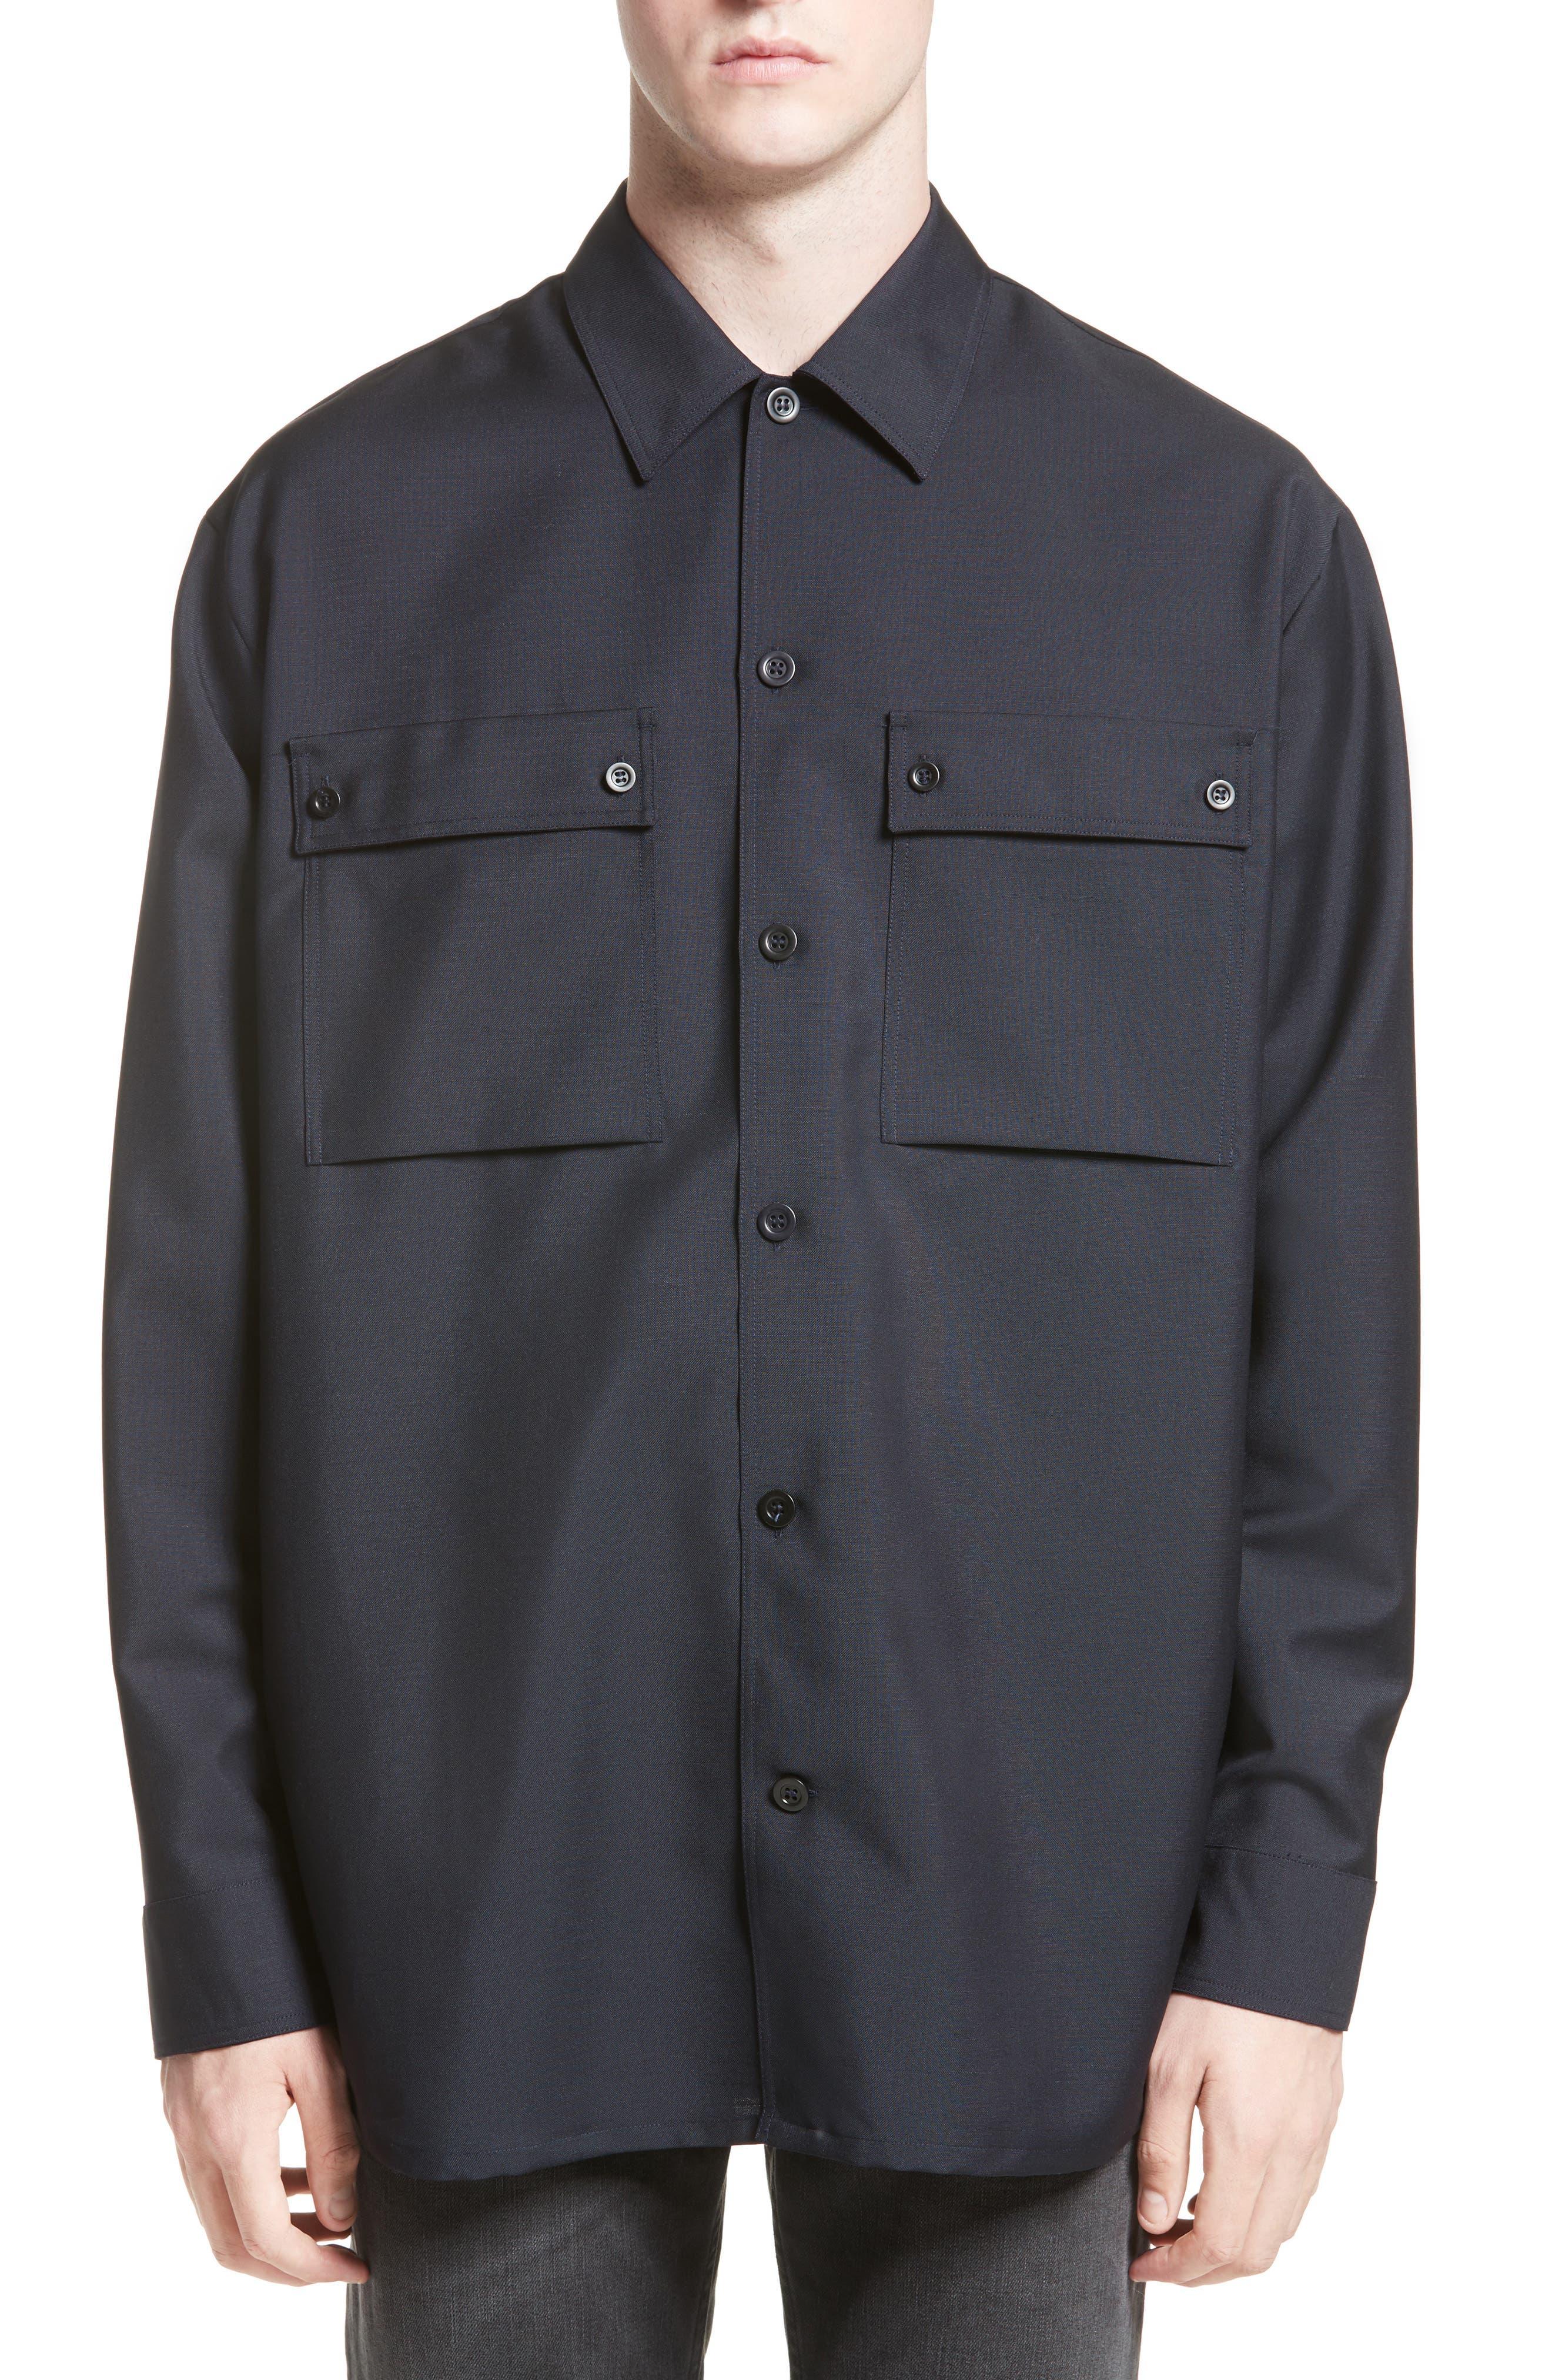 ACNE Studios Houston Double Pocket Shirt